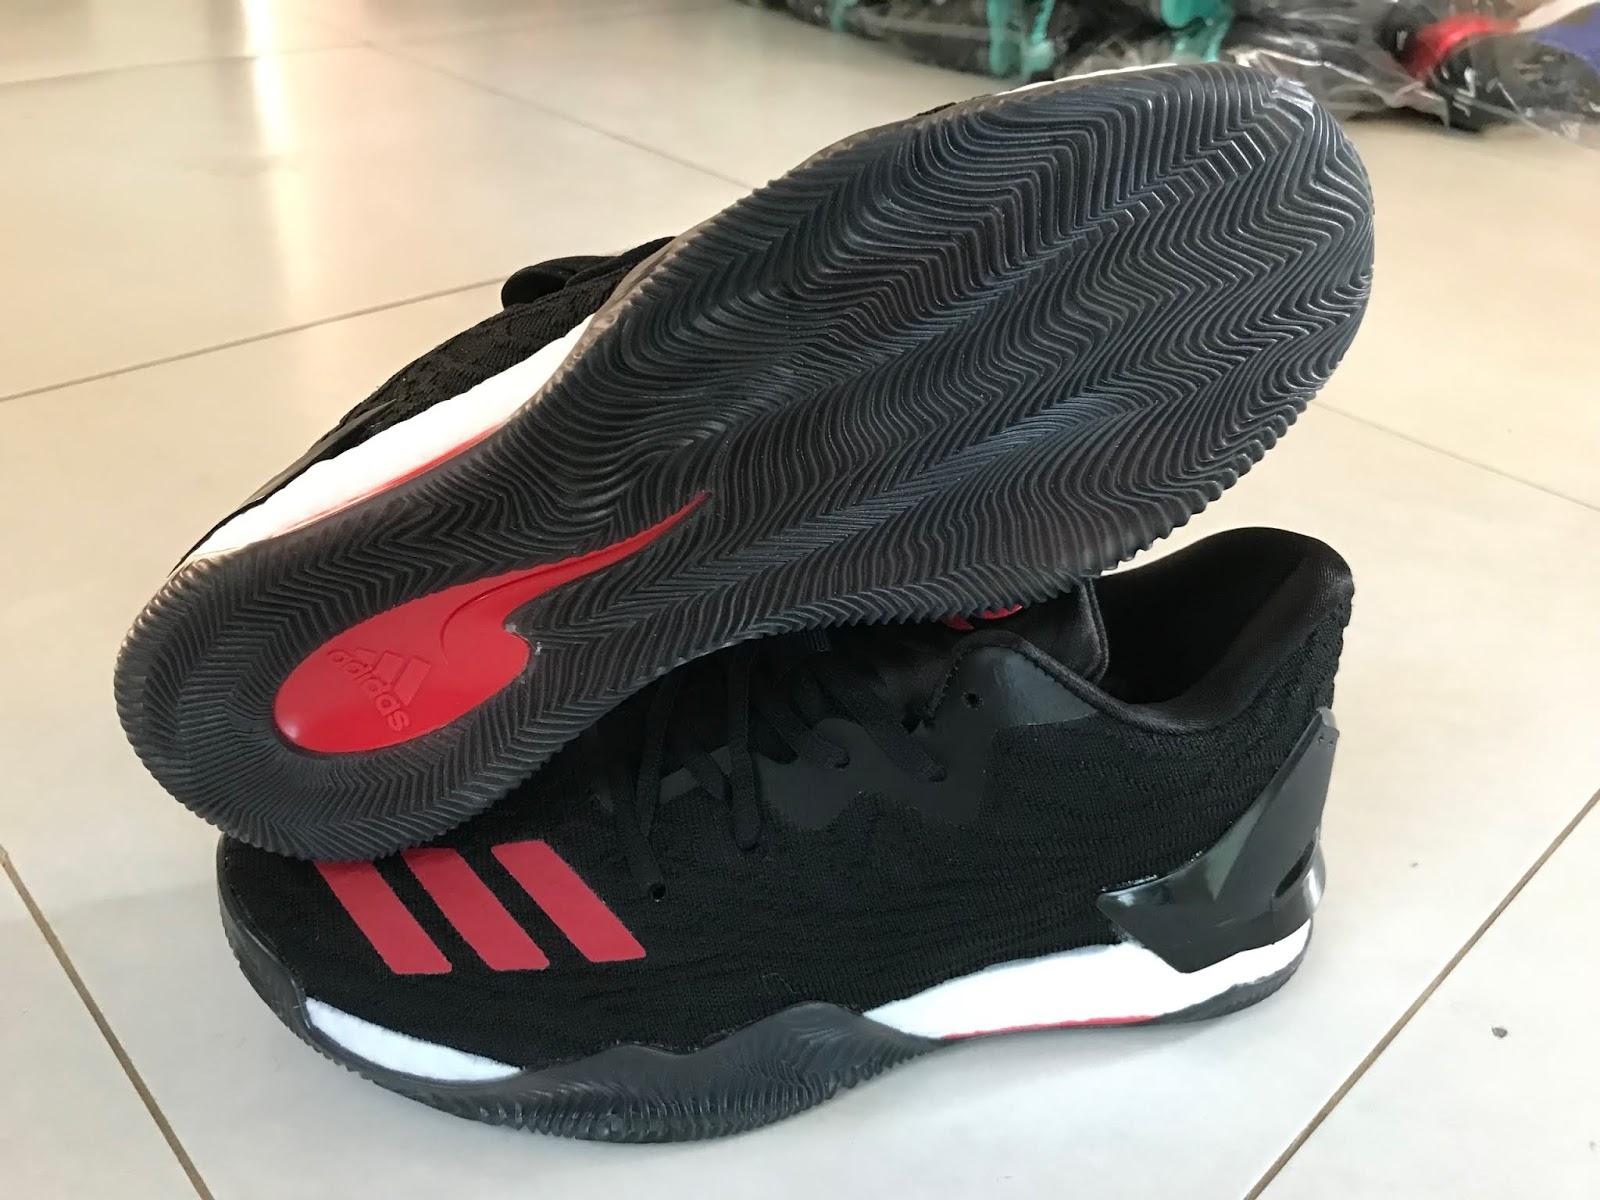 Giày Adidas Nam SF Size 40